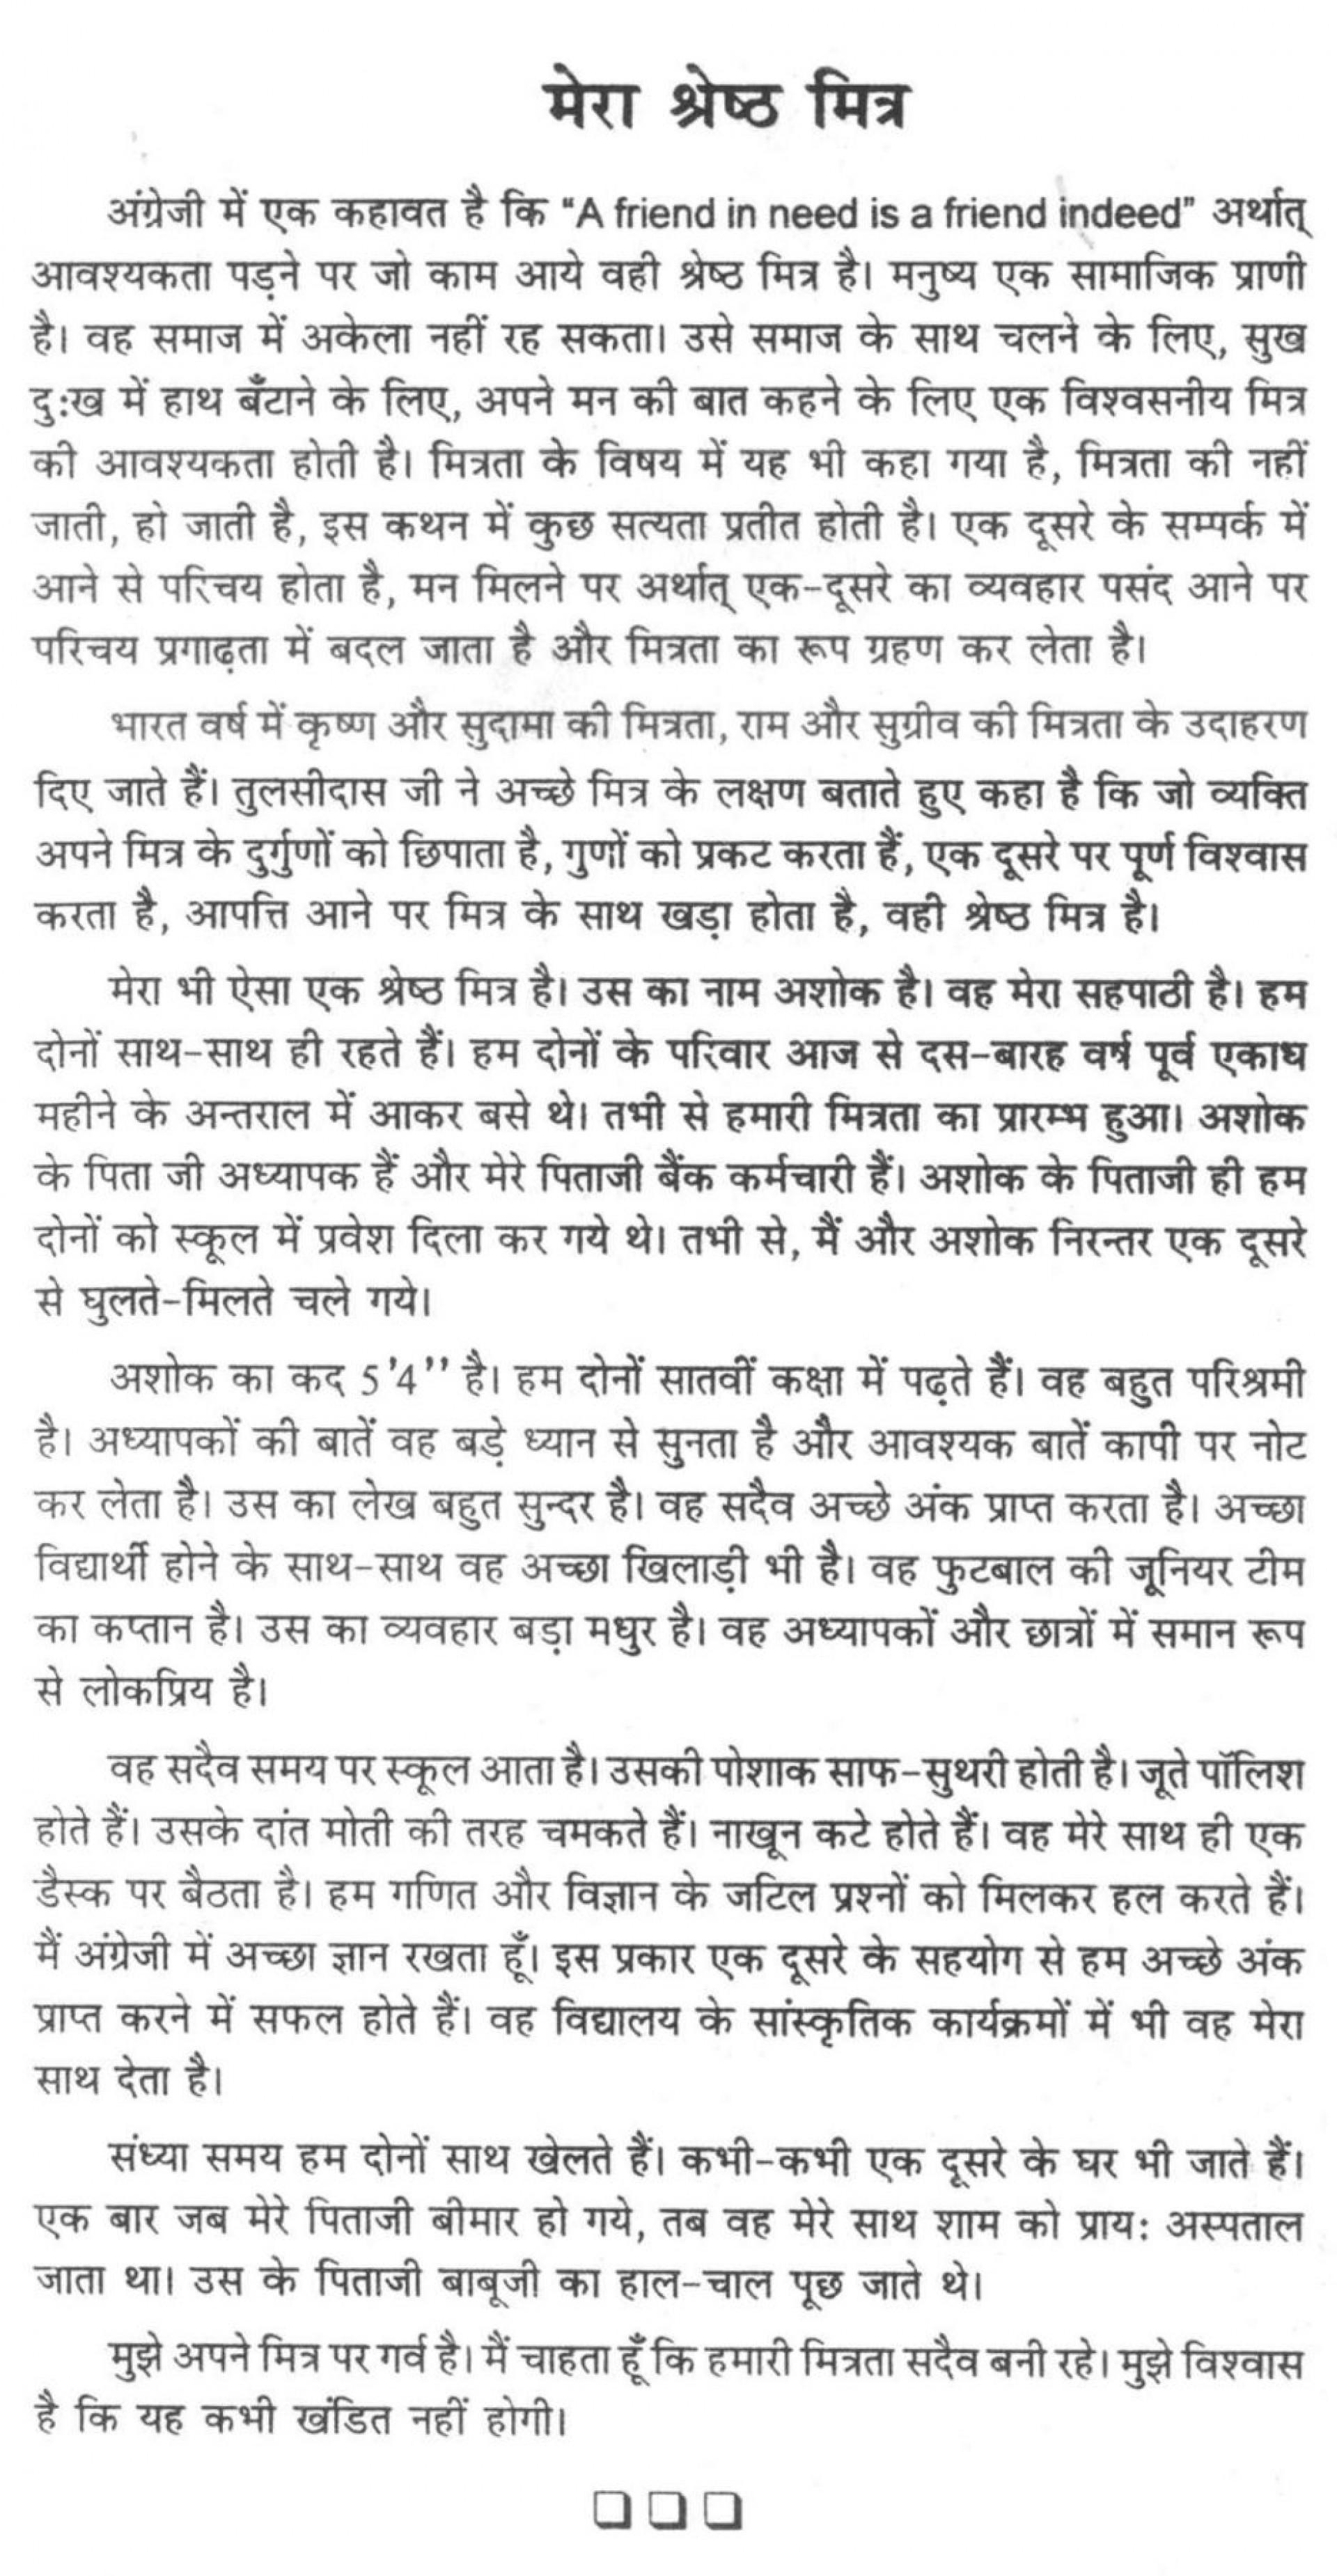 001 Essay Example Qualities Of Good Friend Thumb Teacher Great Characteristics Pdf In Hindi Three Free Language Urdu Exceptional A Short 1920